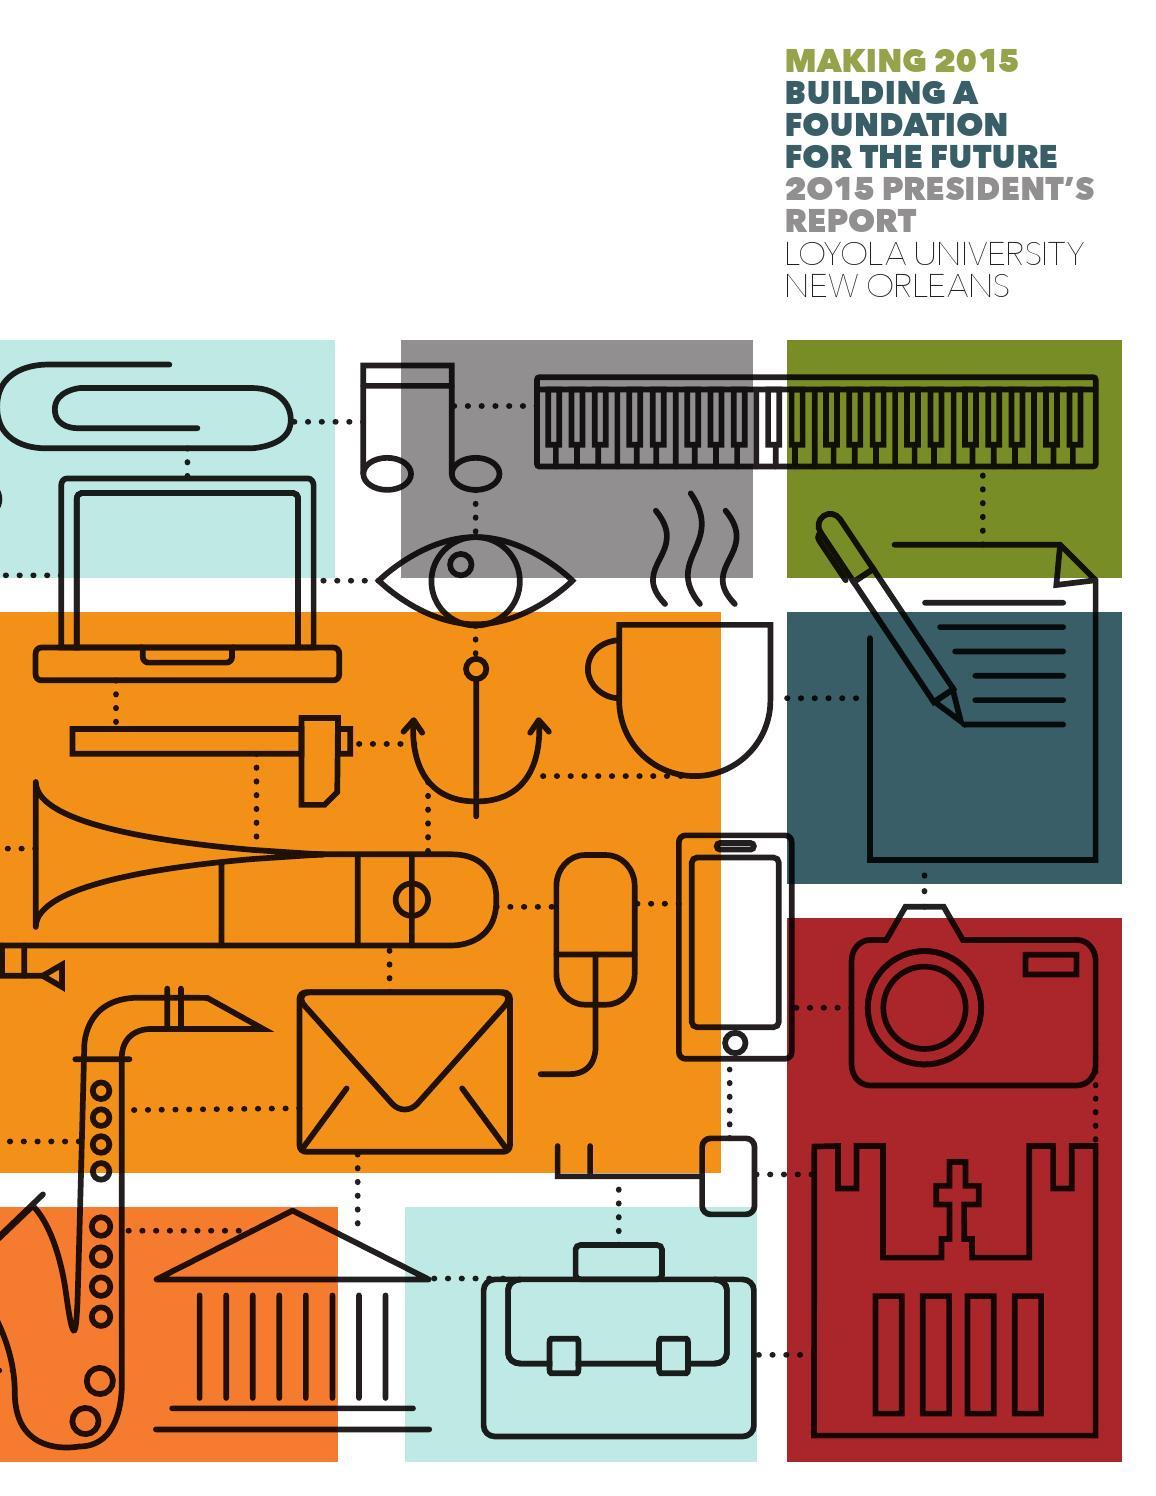 Presidents Report 2015 By Loyola University New Orleans Issuu Artemis Fan Wiring Diagram